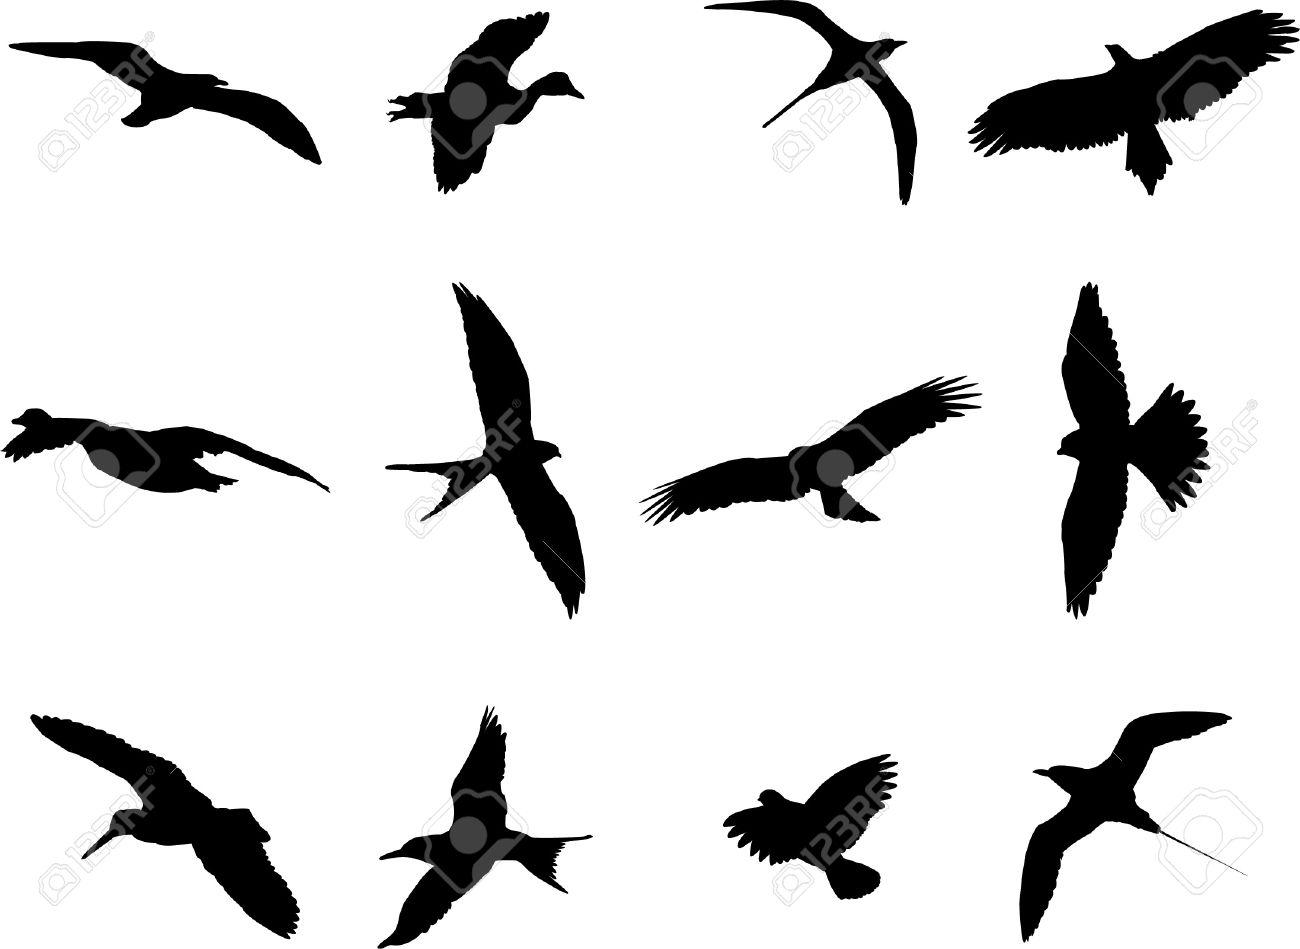 427 Albatross Stock Vector Illustration And Royalty Free Albatross.